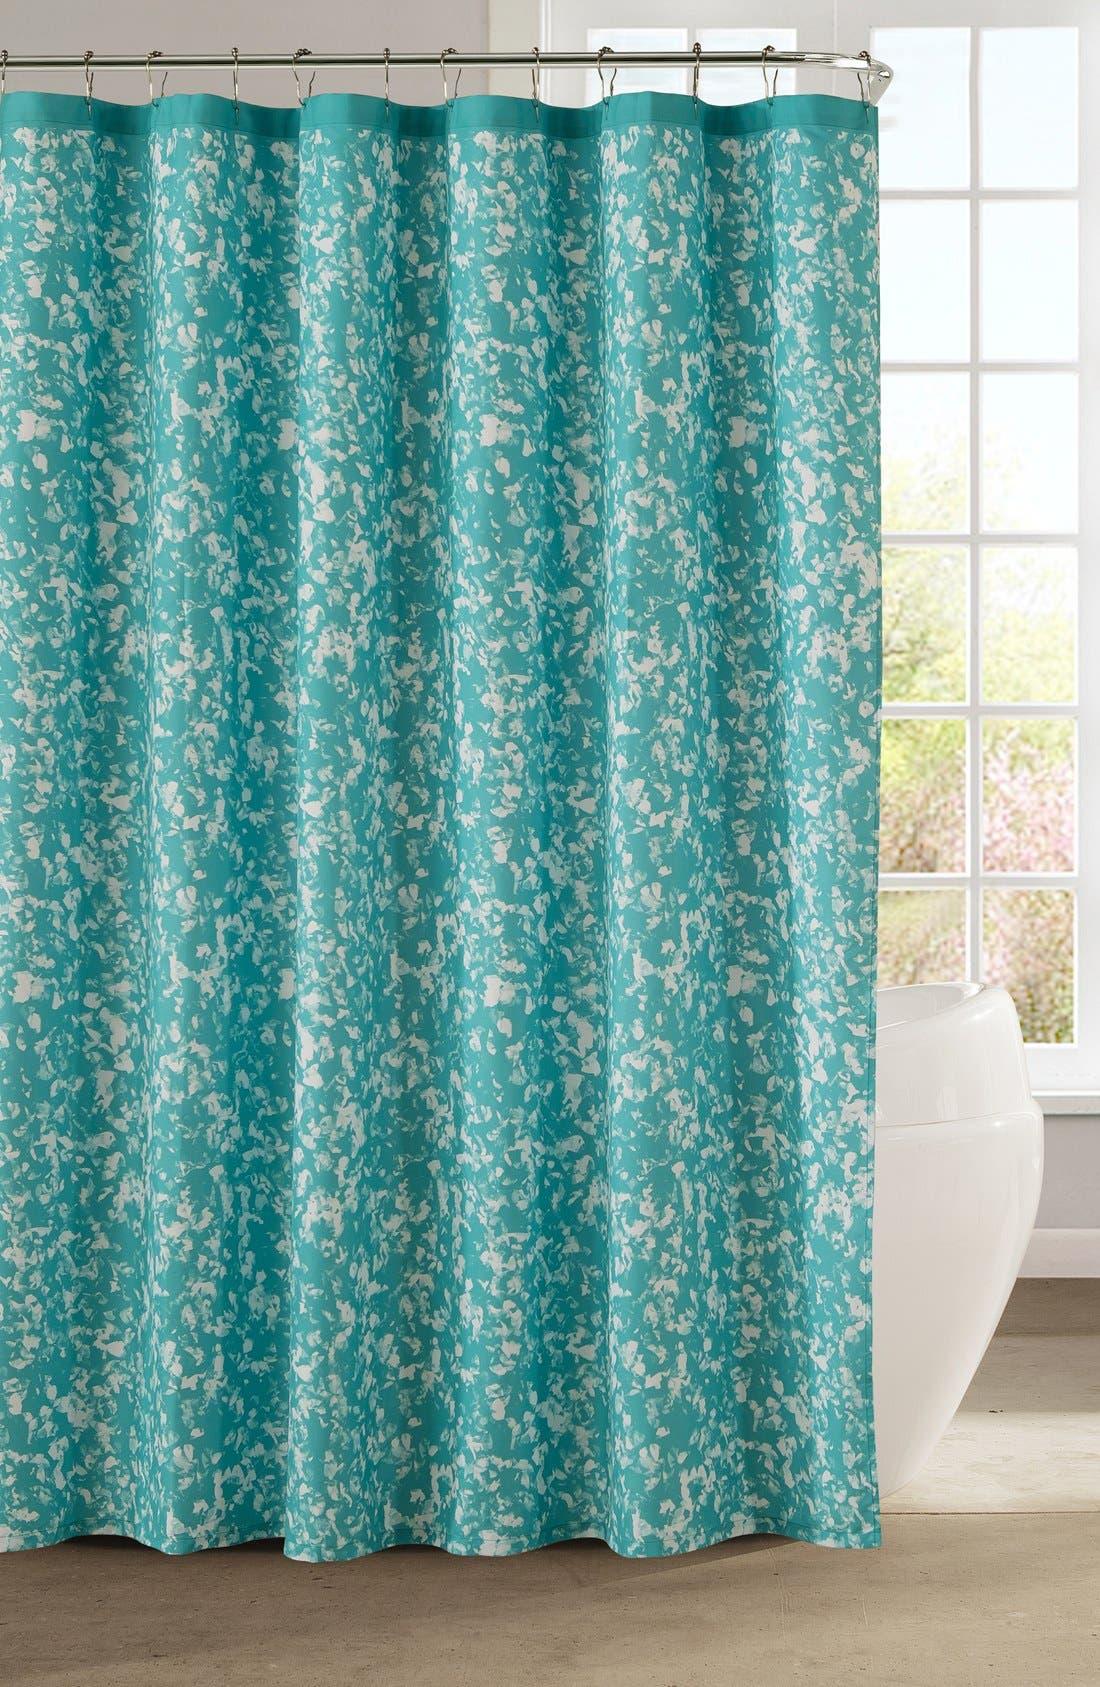 'Susie' Shower Curtain,                         Main,                         color, Hazy Aqua